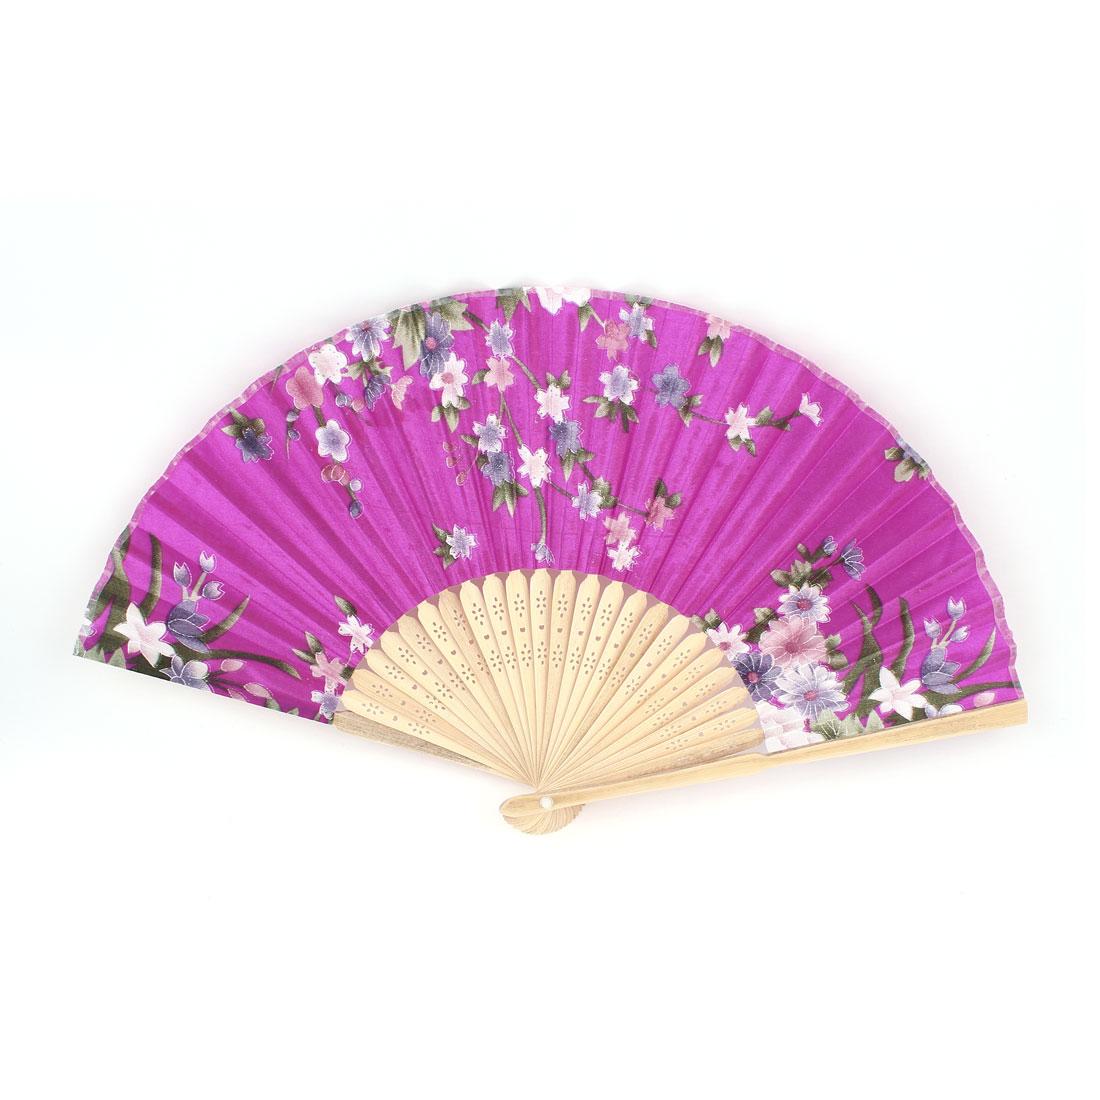 Peony Pattern Hollow Out Design Bamboo Ribs Folded Hand Fan Fuchsia